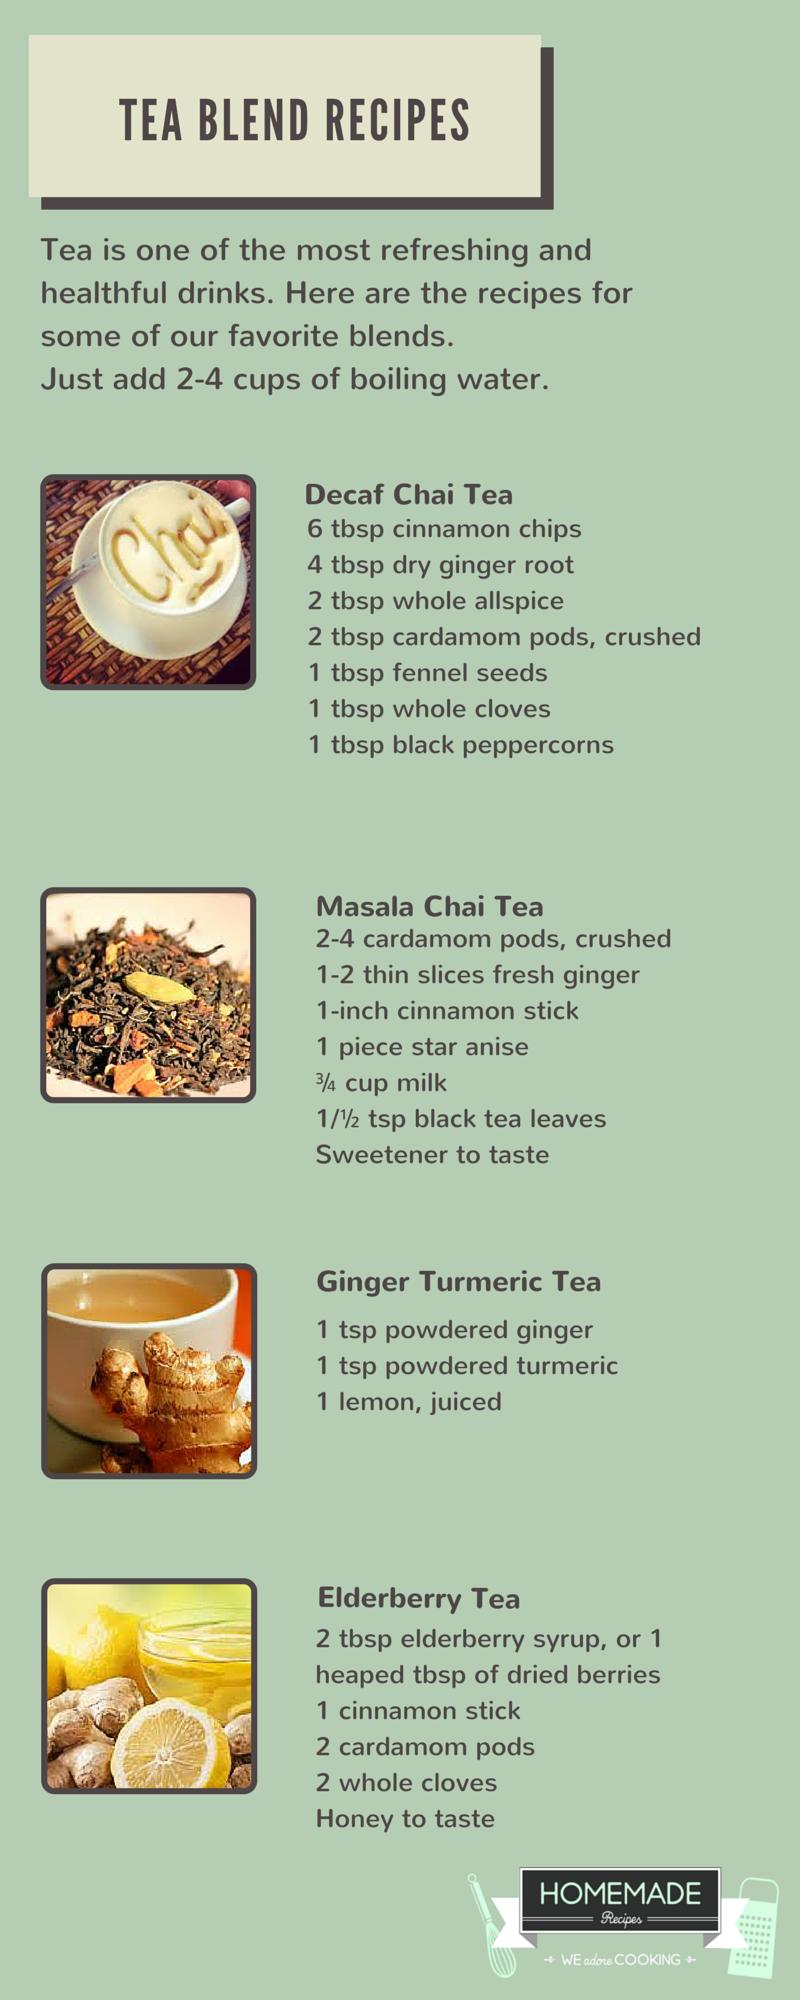 Chi Tea, Elderberry Tea and Ginger Turmeric Tea Blend Recipes by